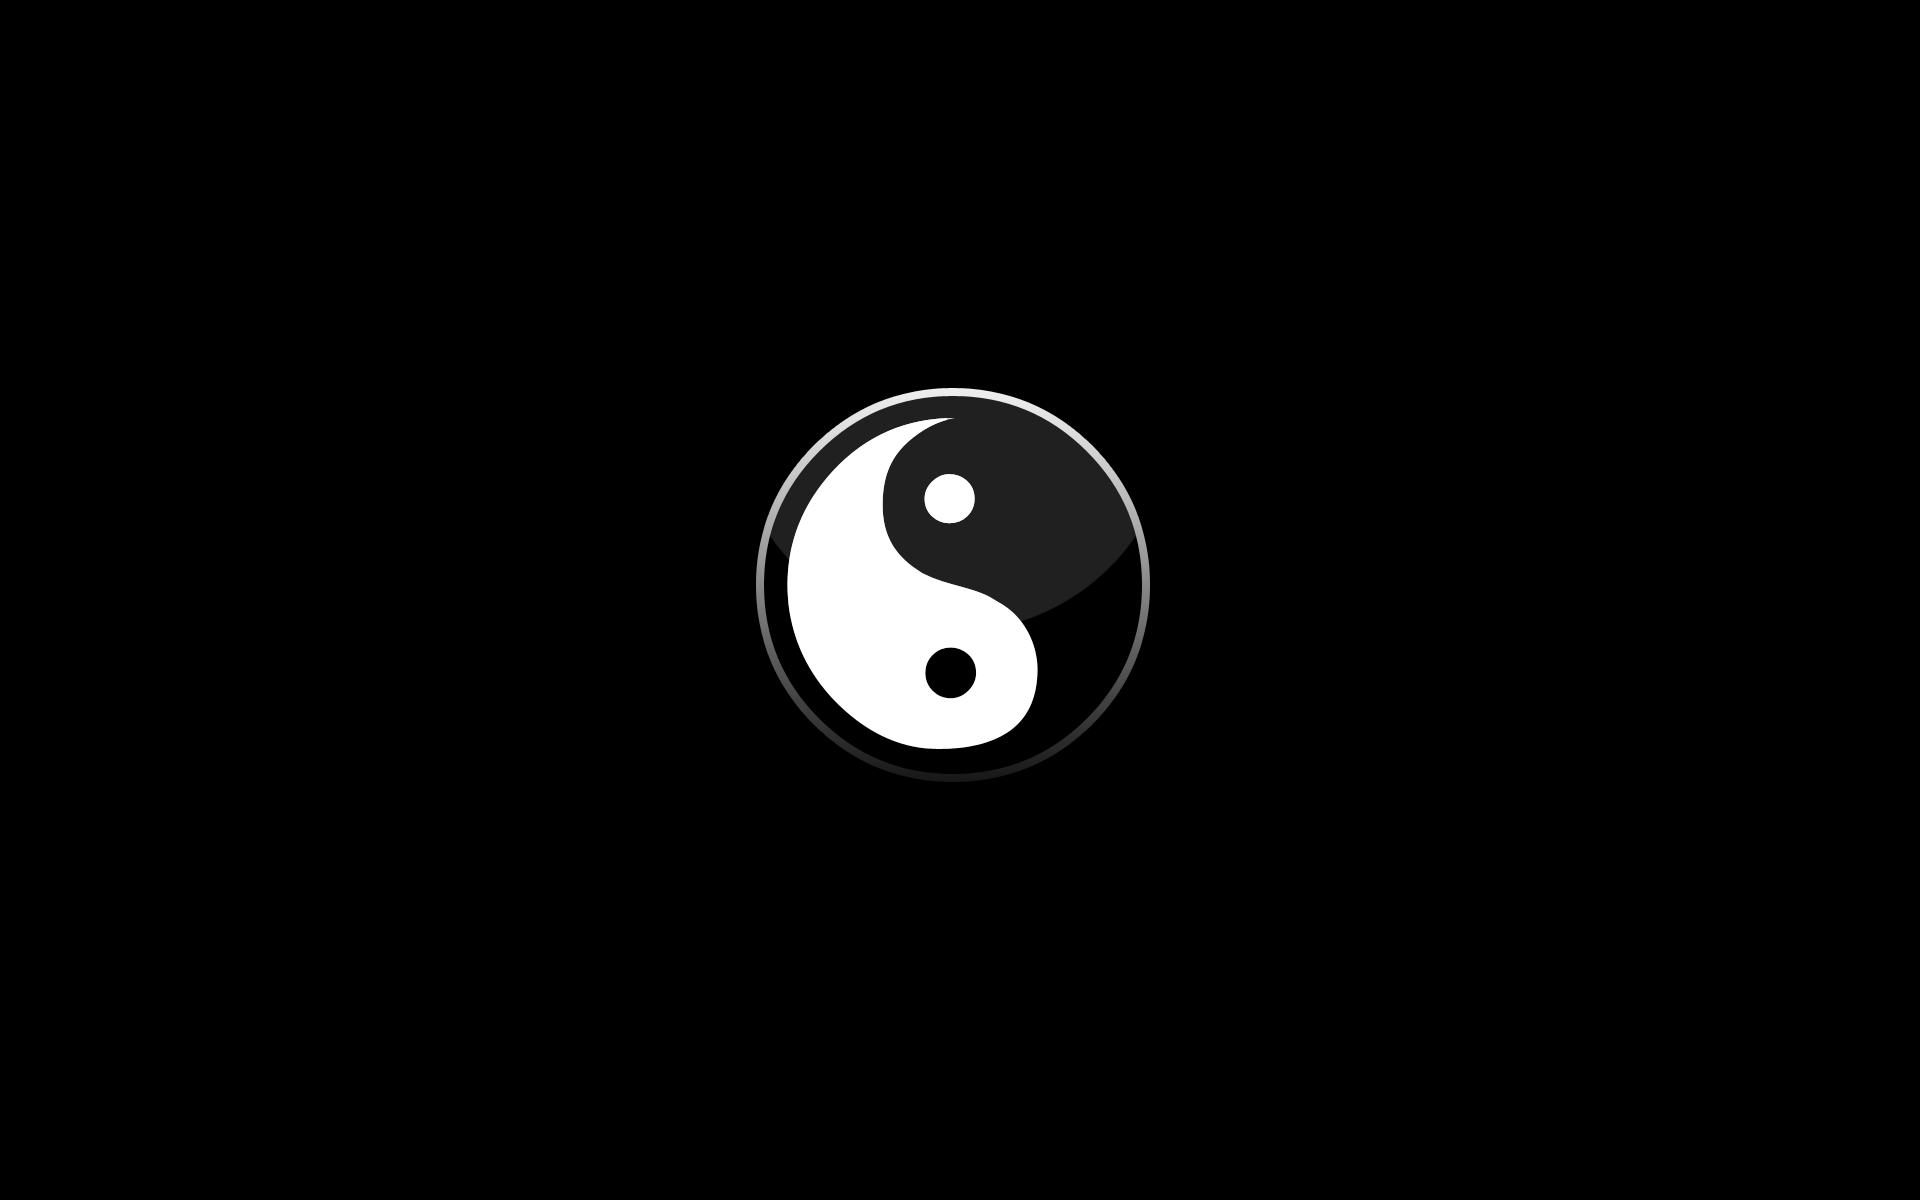 scenery wallpaper: wallpaper yin yang